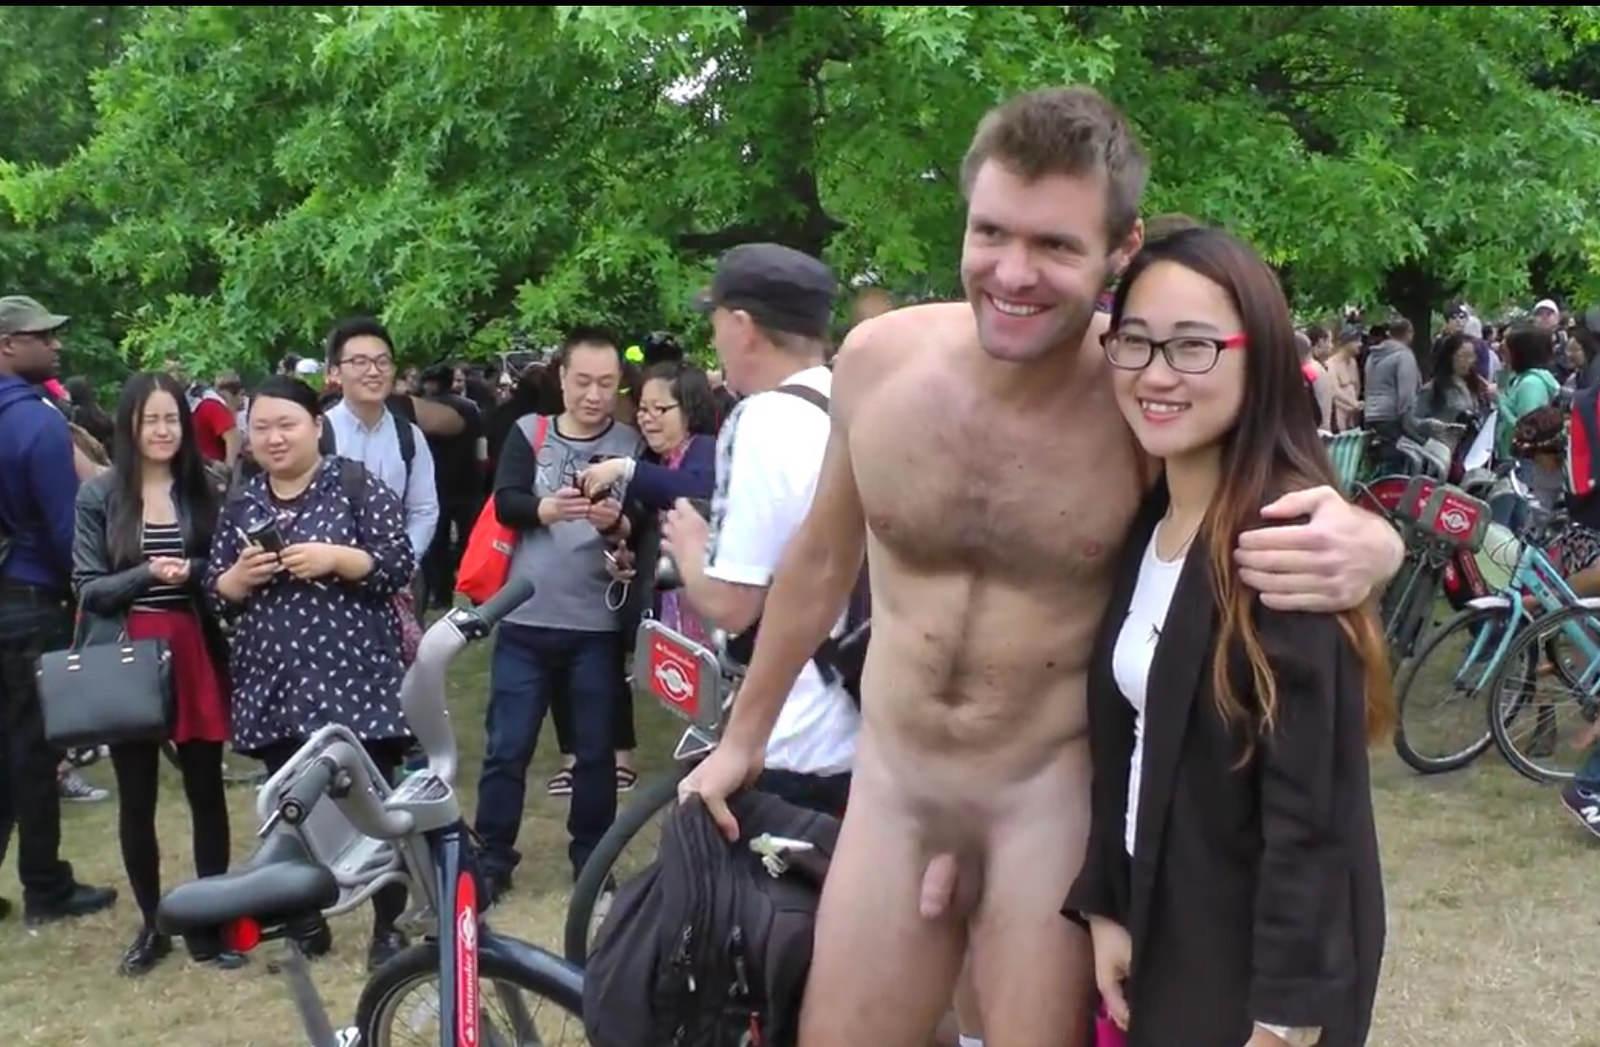 Cfnm Embarrassed Male-7336